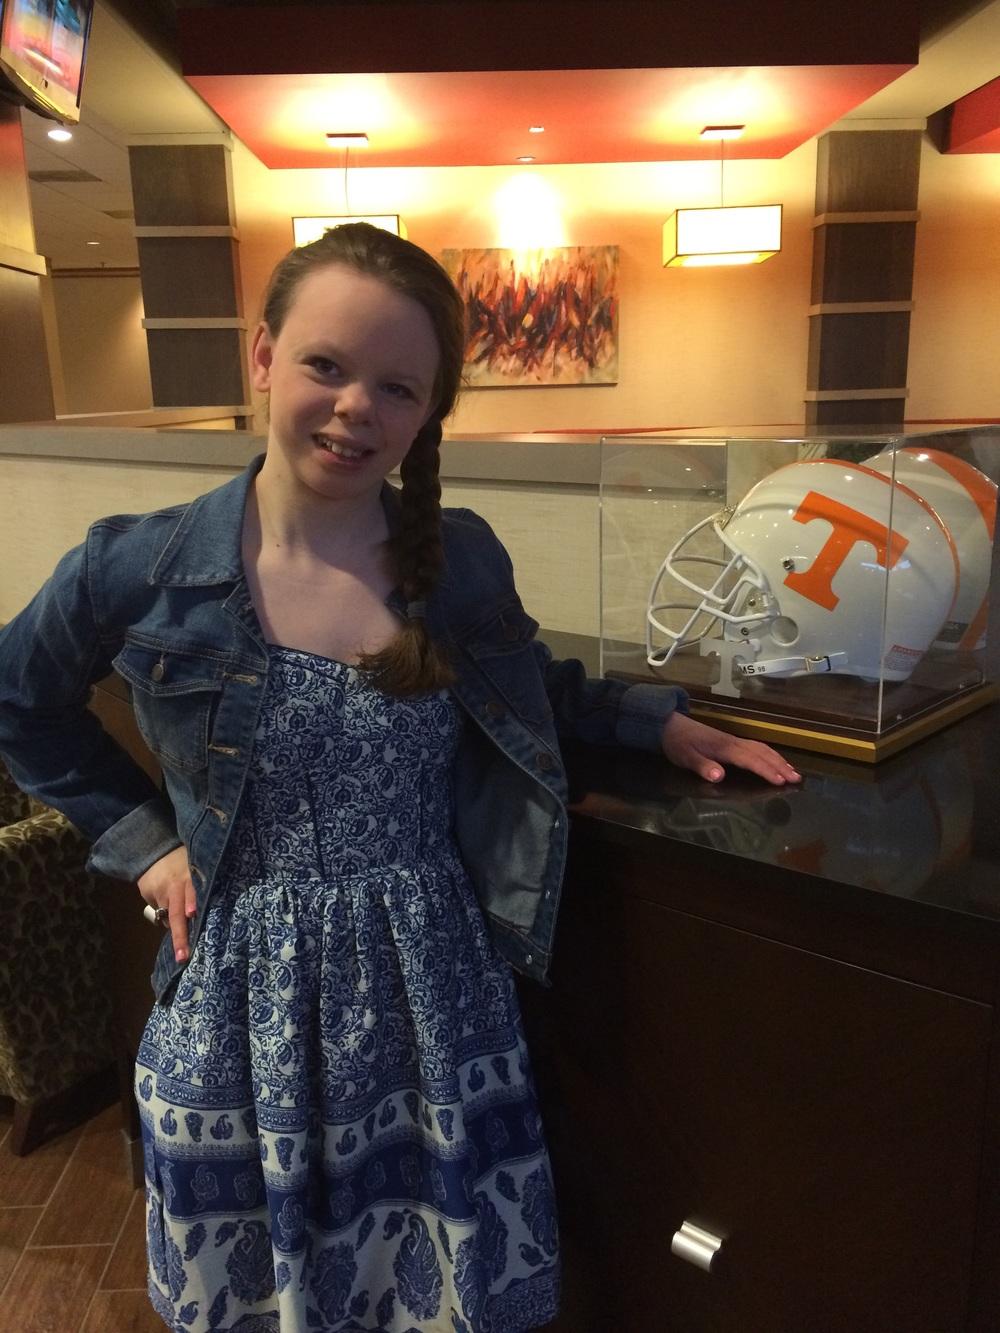 Chloe spotted a UT helmet - go figure!